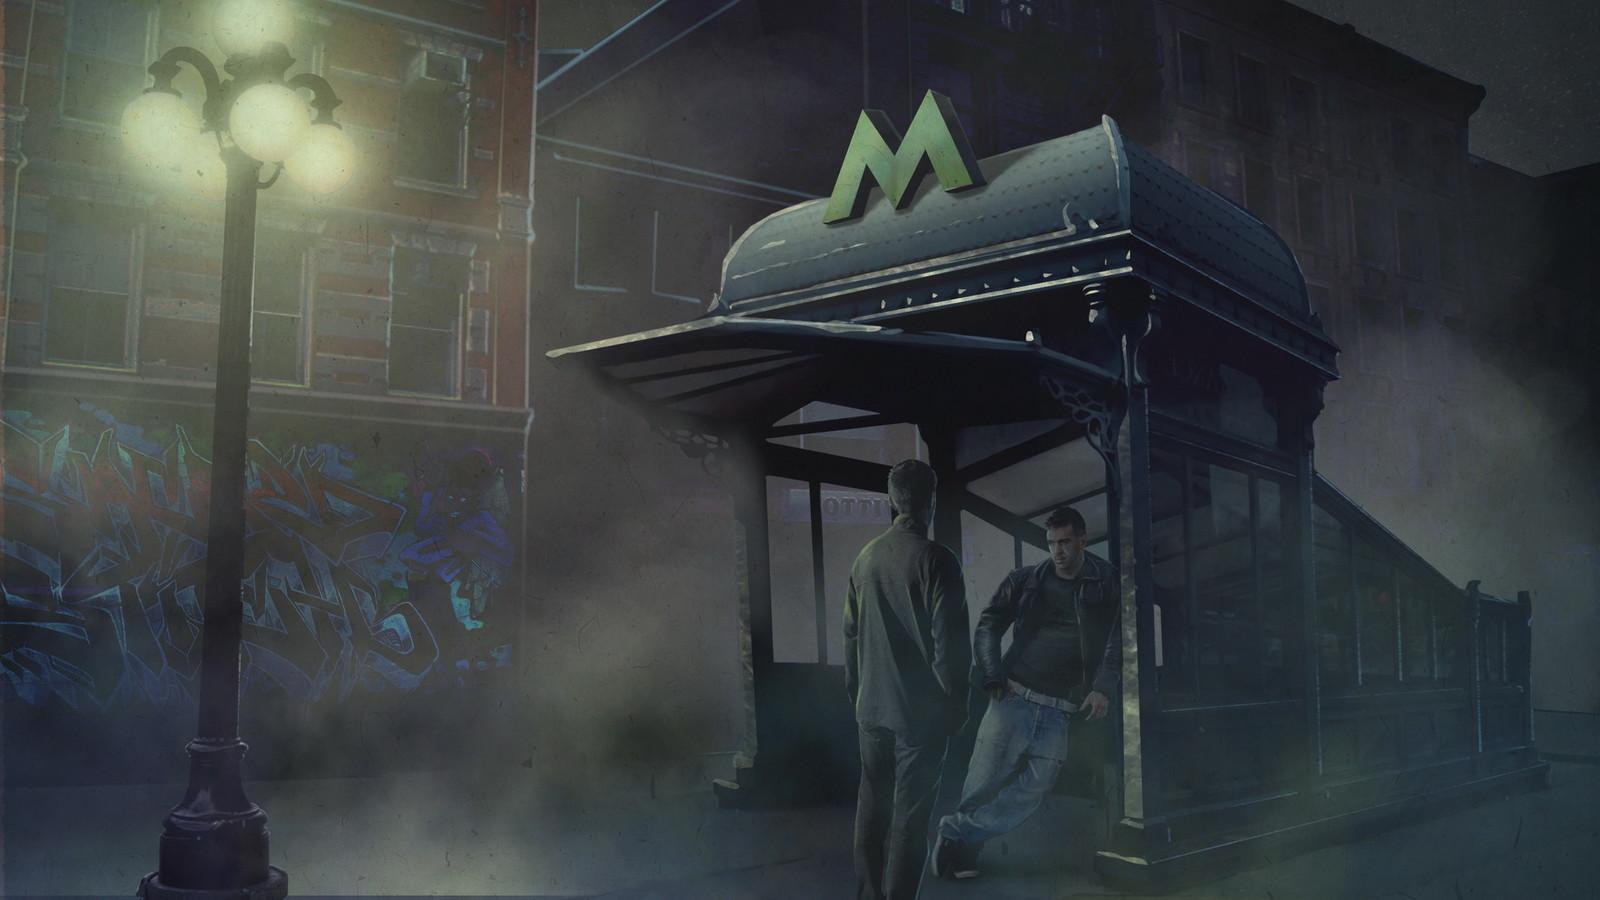 Scene 2 - Subway entrance